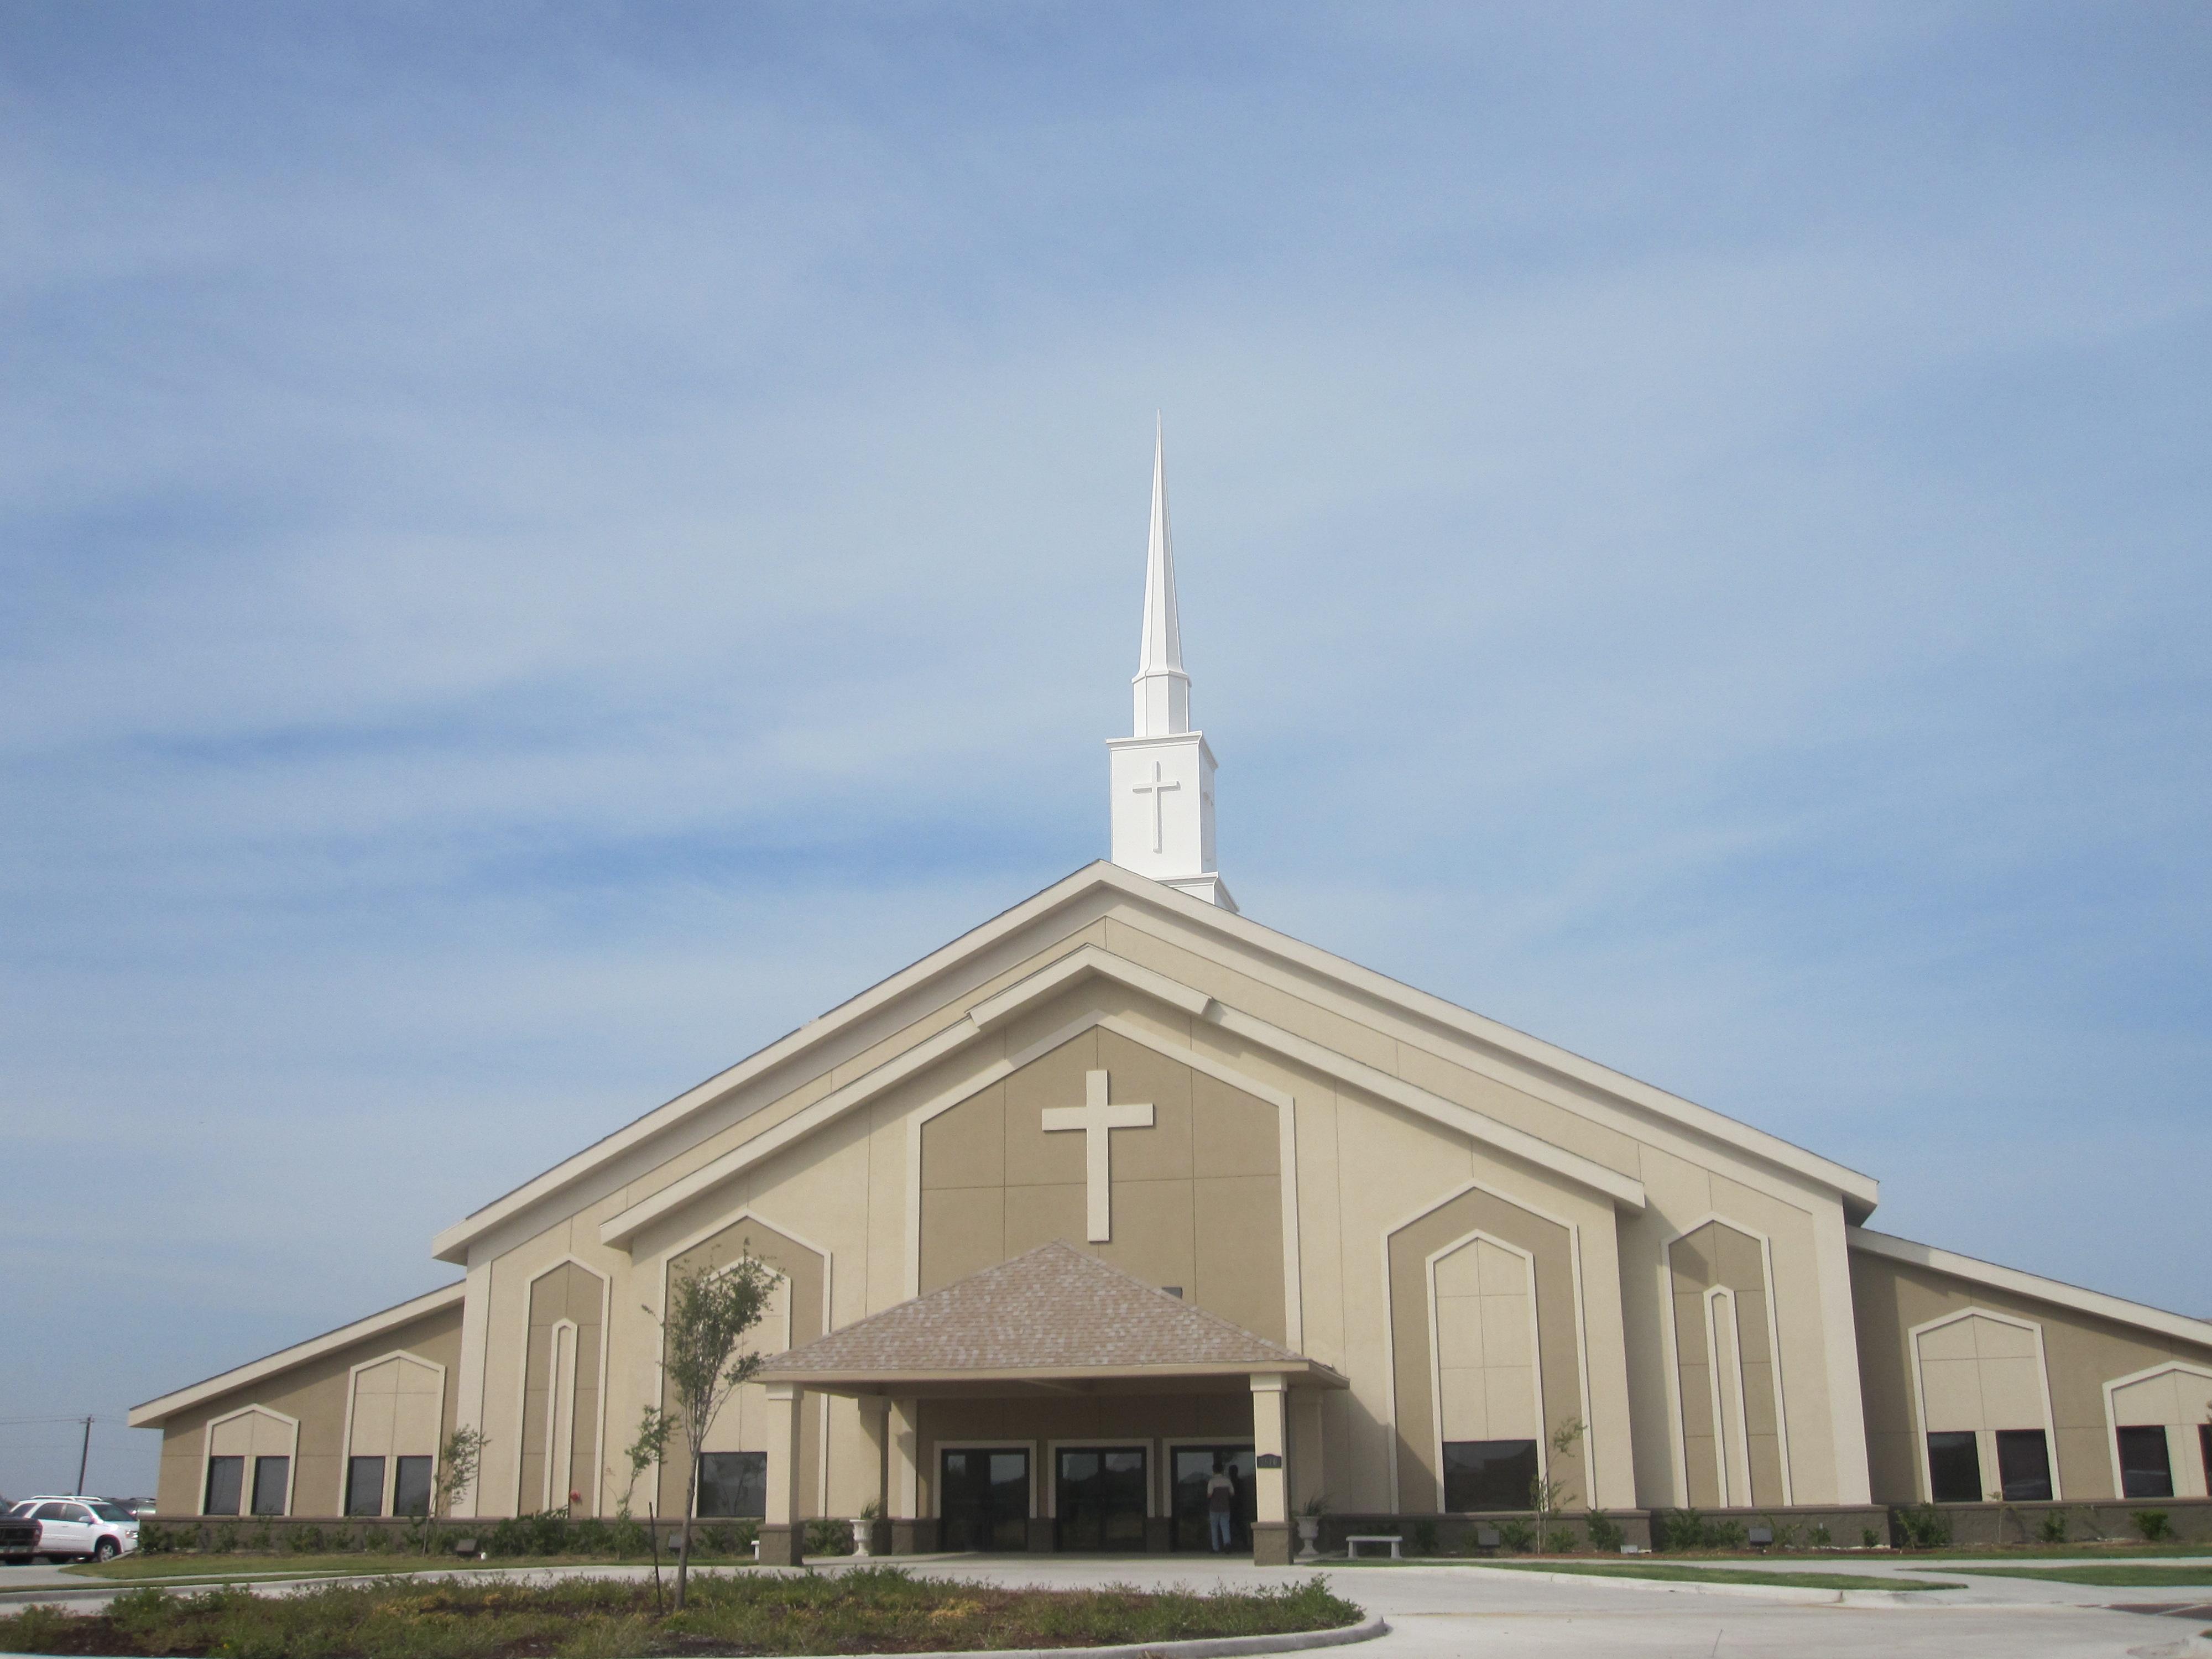 Creative Floor Plans File Revised First Baptist Church Of Laredo Tx Img 0852